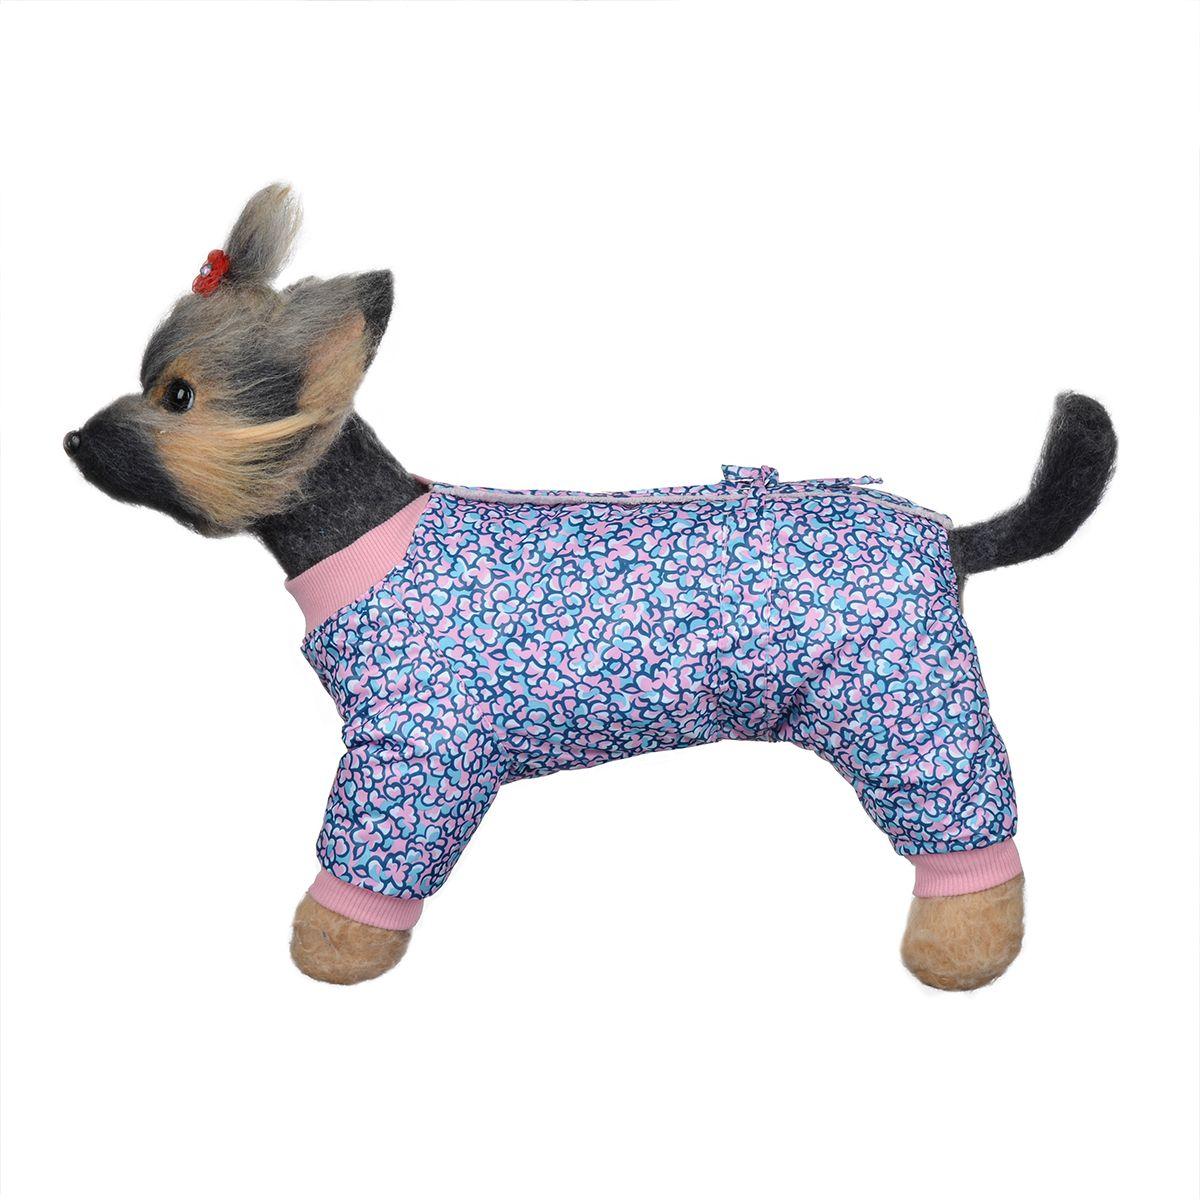 "Комбинезон для собак Dogmoda ""Лаки"", зимний, для девочки, цвет: розовый, синий. Размер 3 (L)"